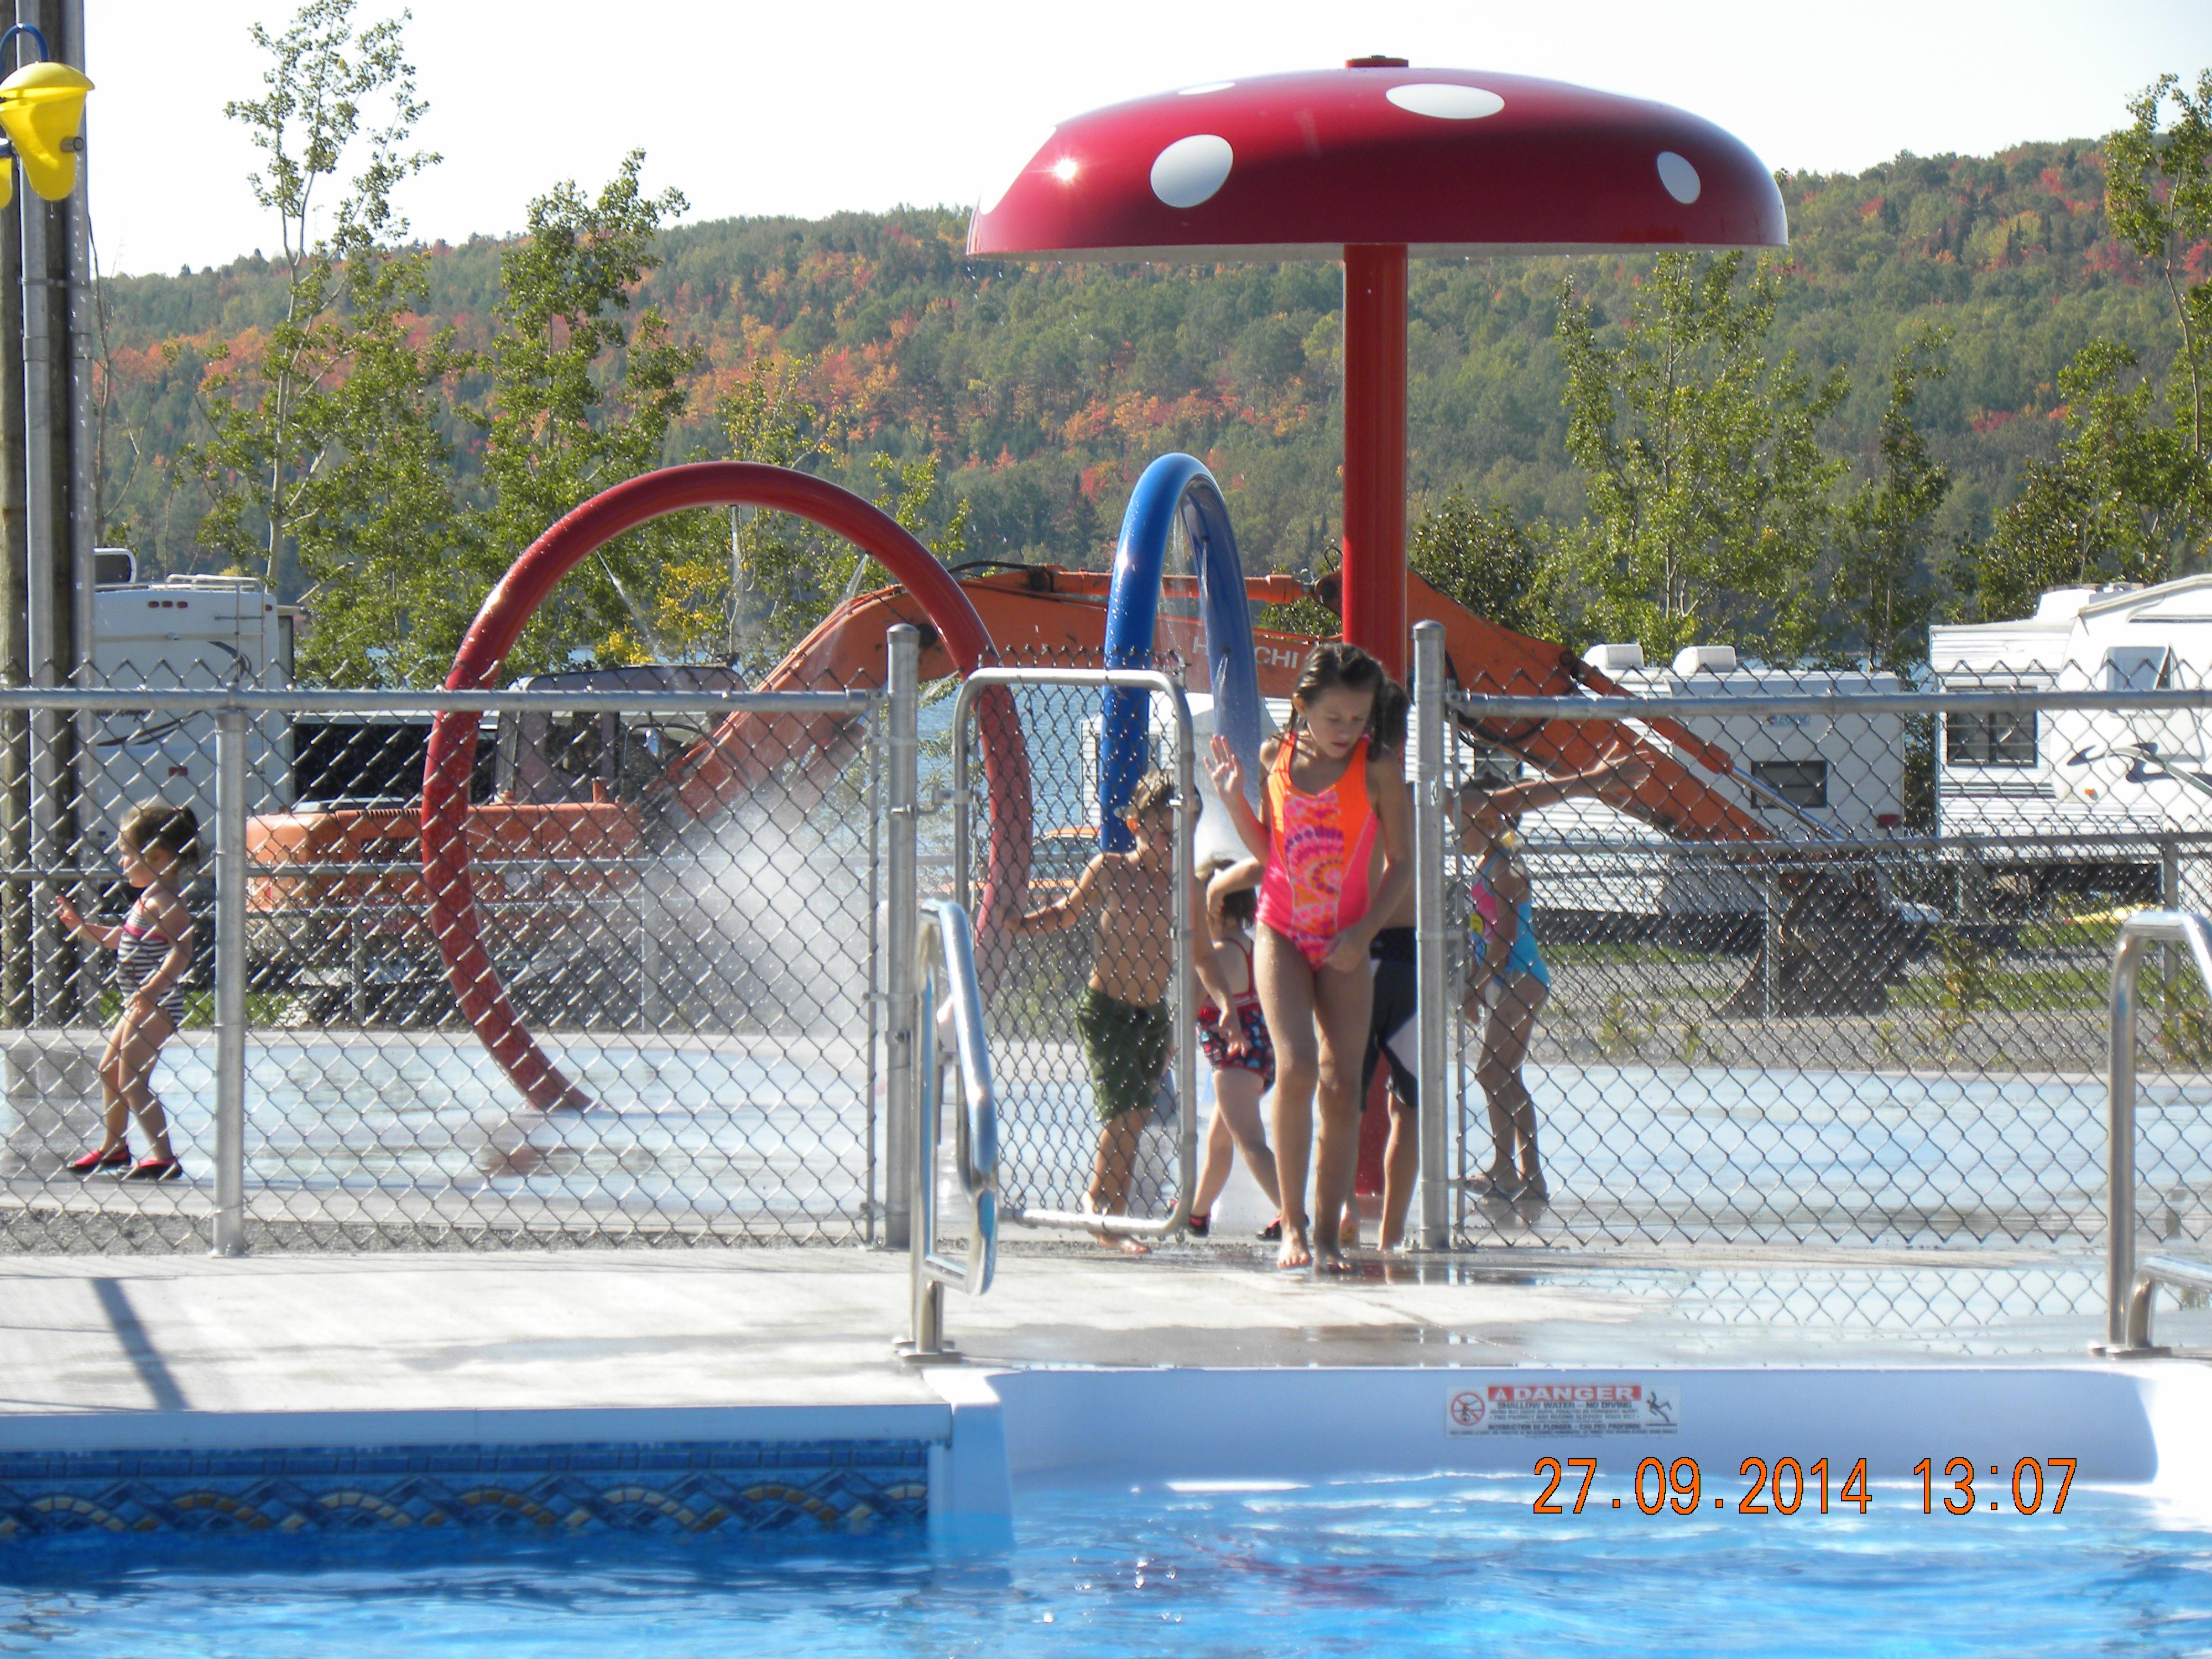 Bas Saint-Laurent KOA Resort